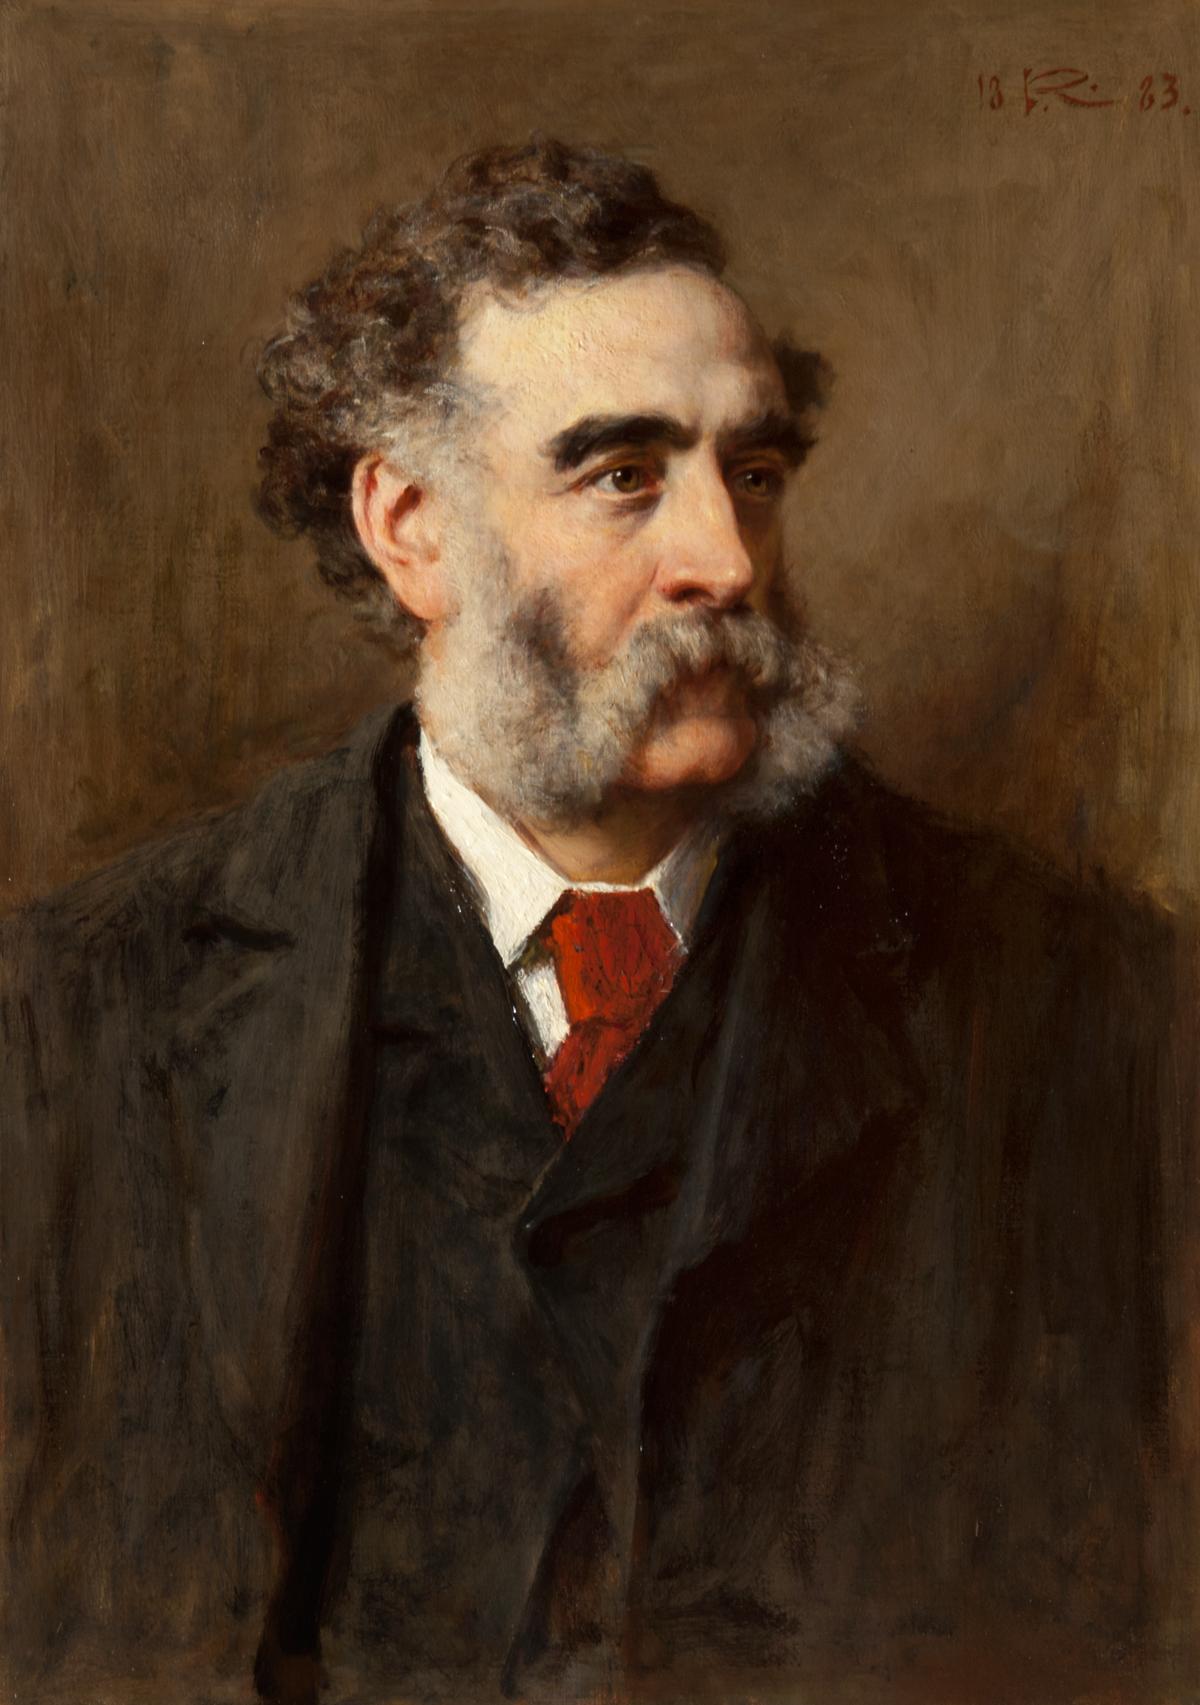 Argyll Robertson